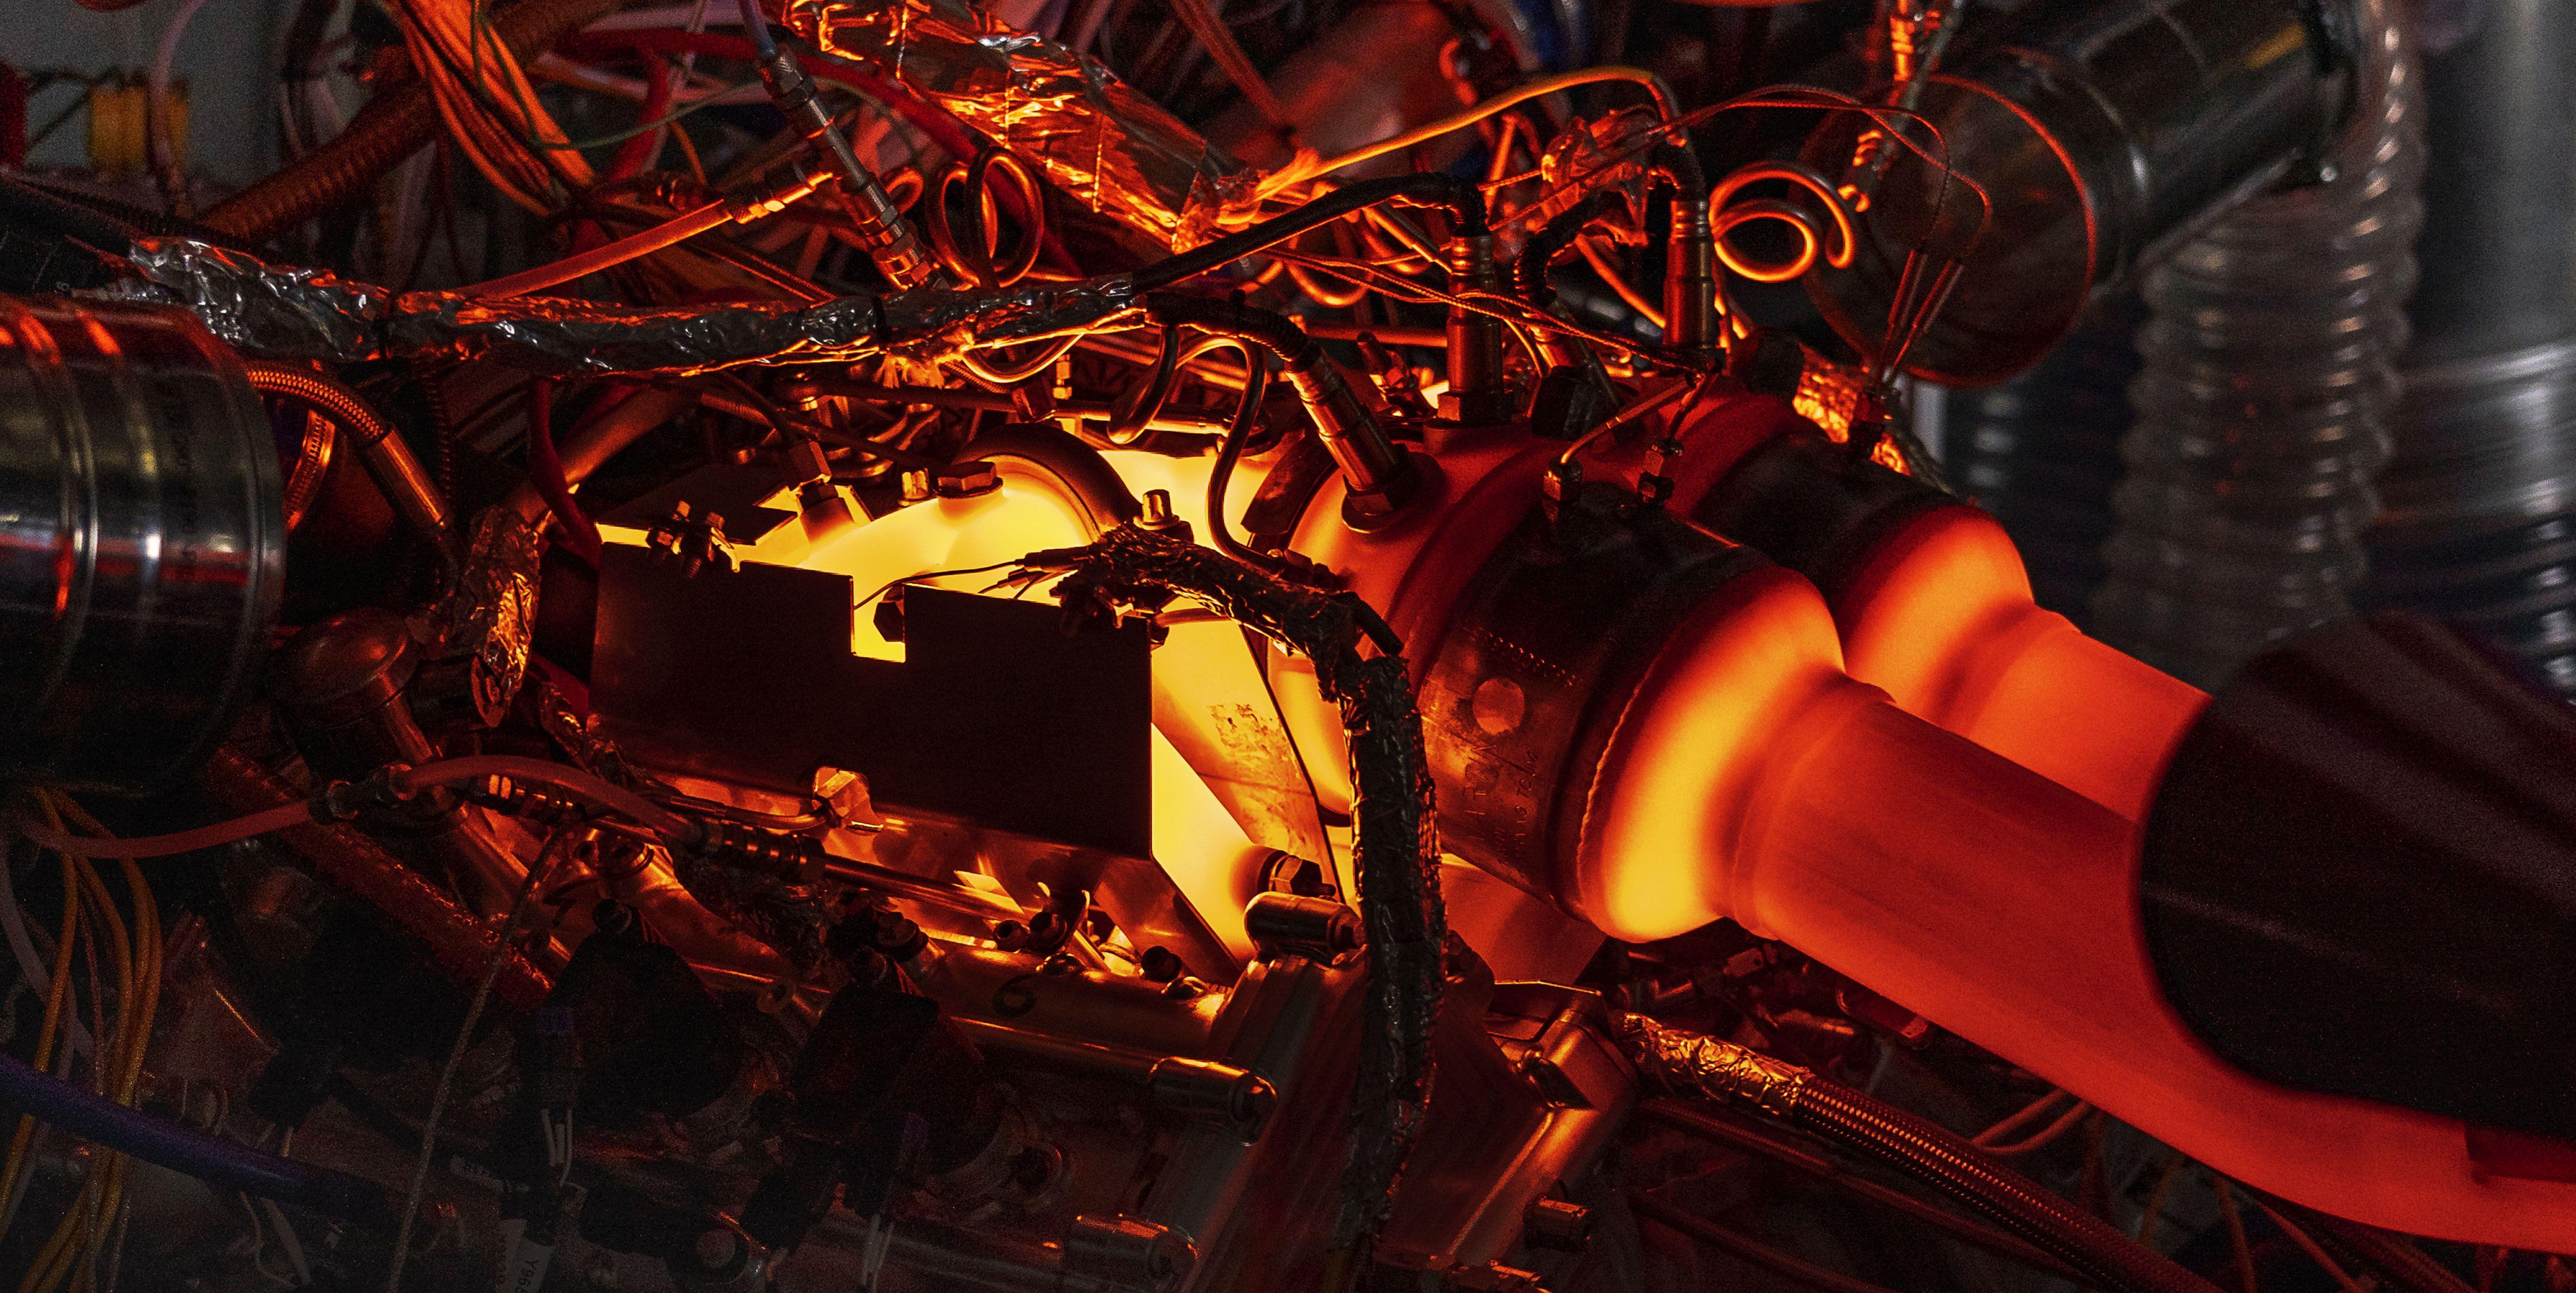 See and Hear Aston Martin's Powerful New Hybrid 3.0-Liter V-6